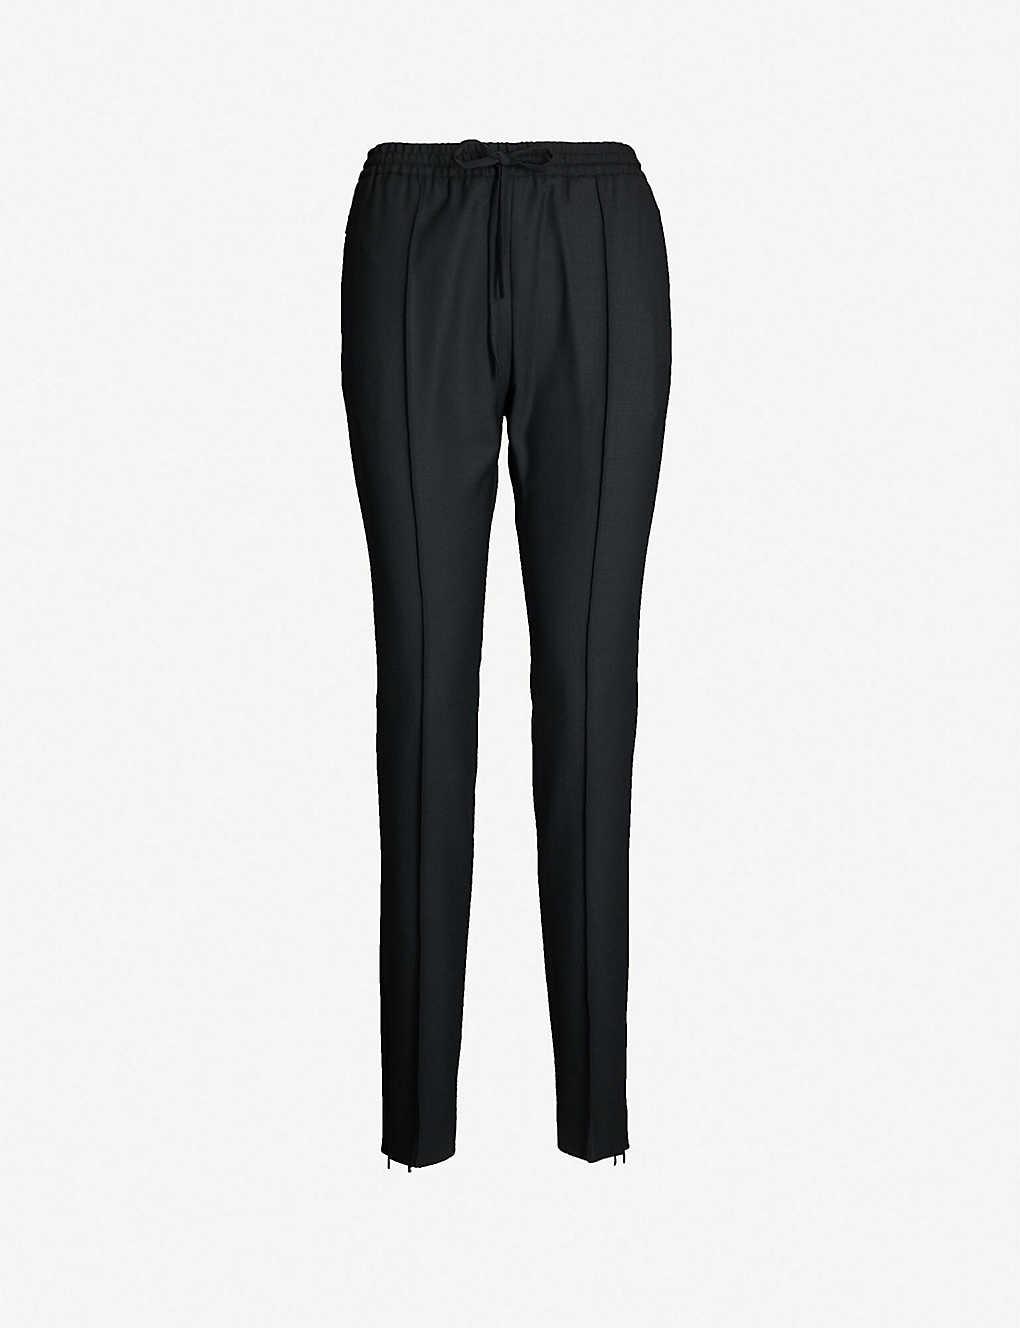 4f7b18e7aa3 JOSEPH - New Dallas Comfort elasticated-waist slim-fit trousers ...